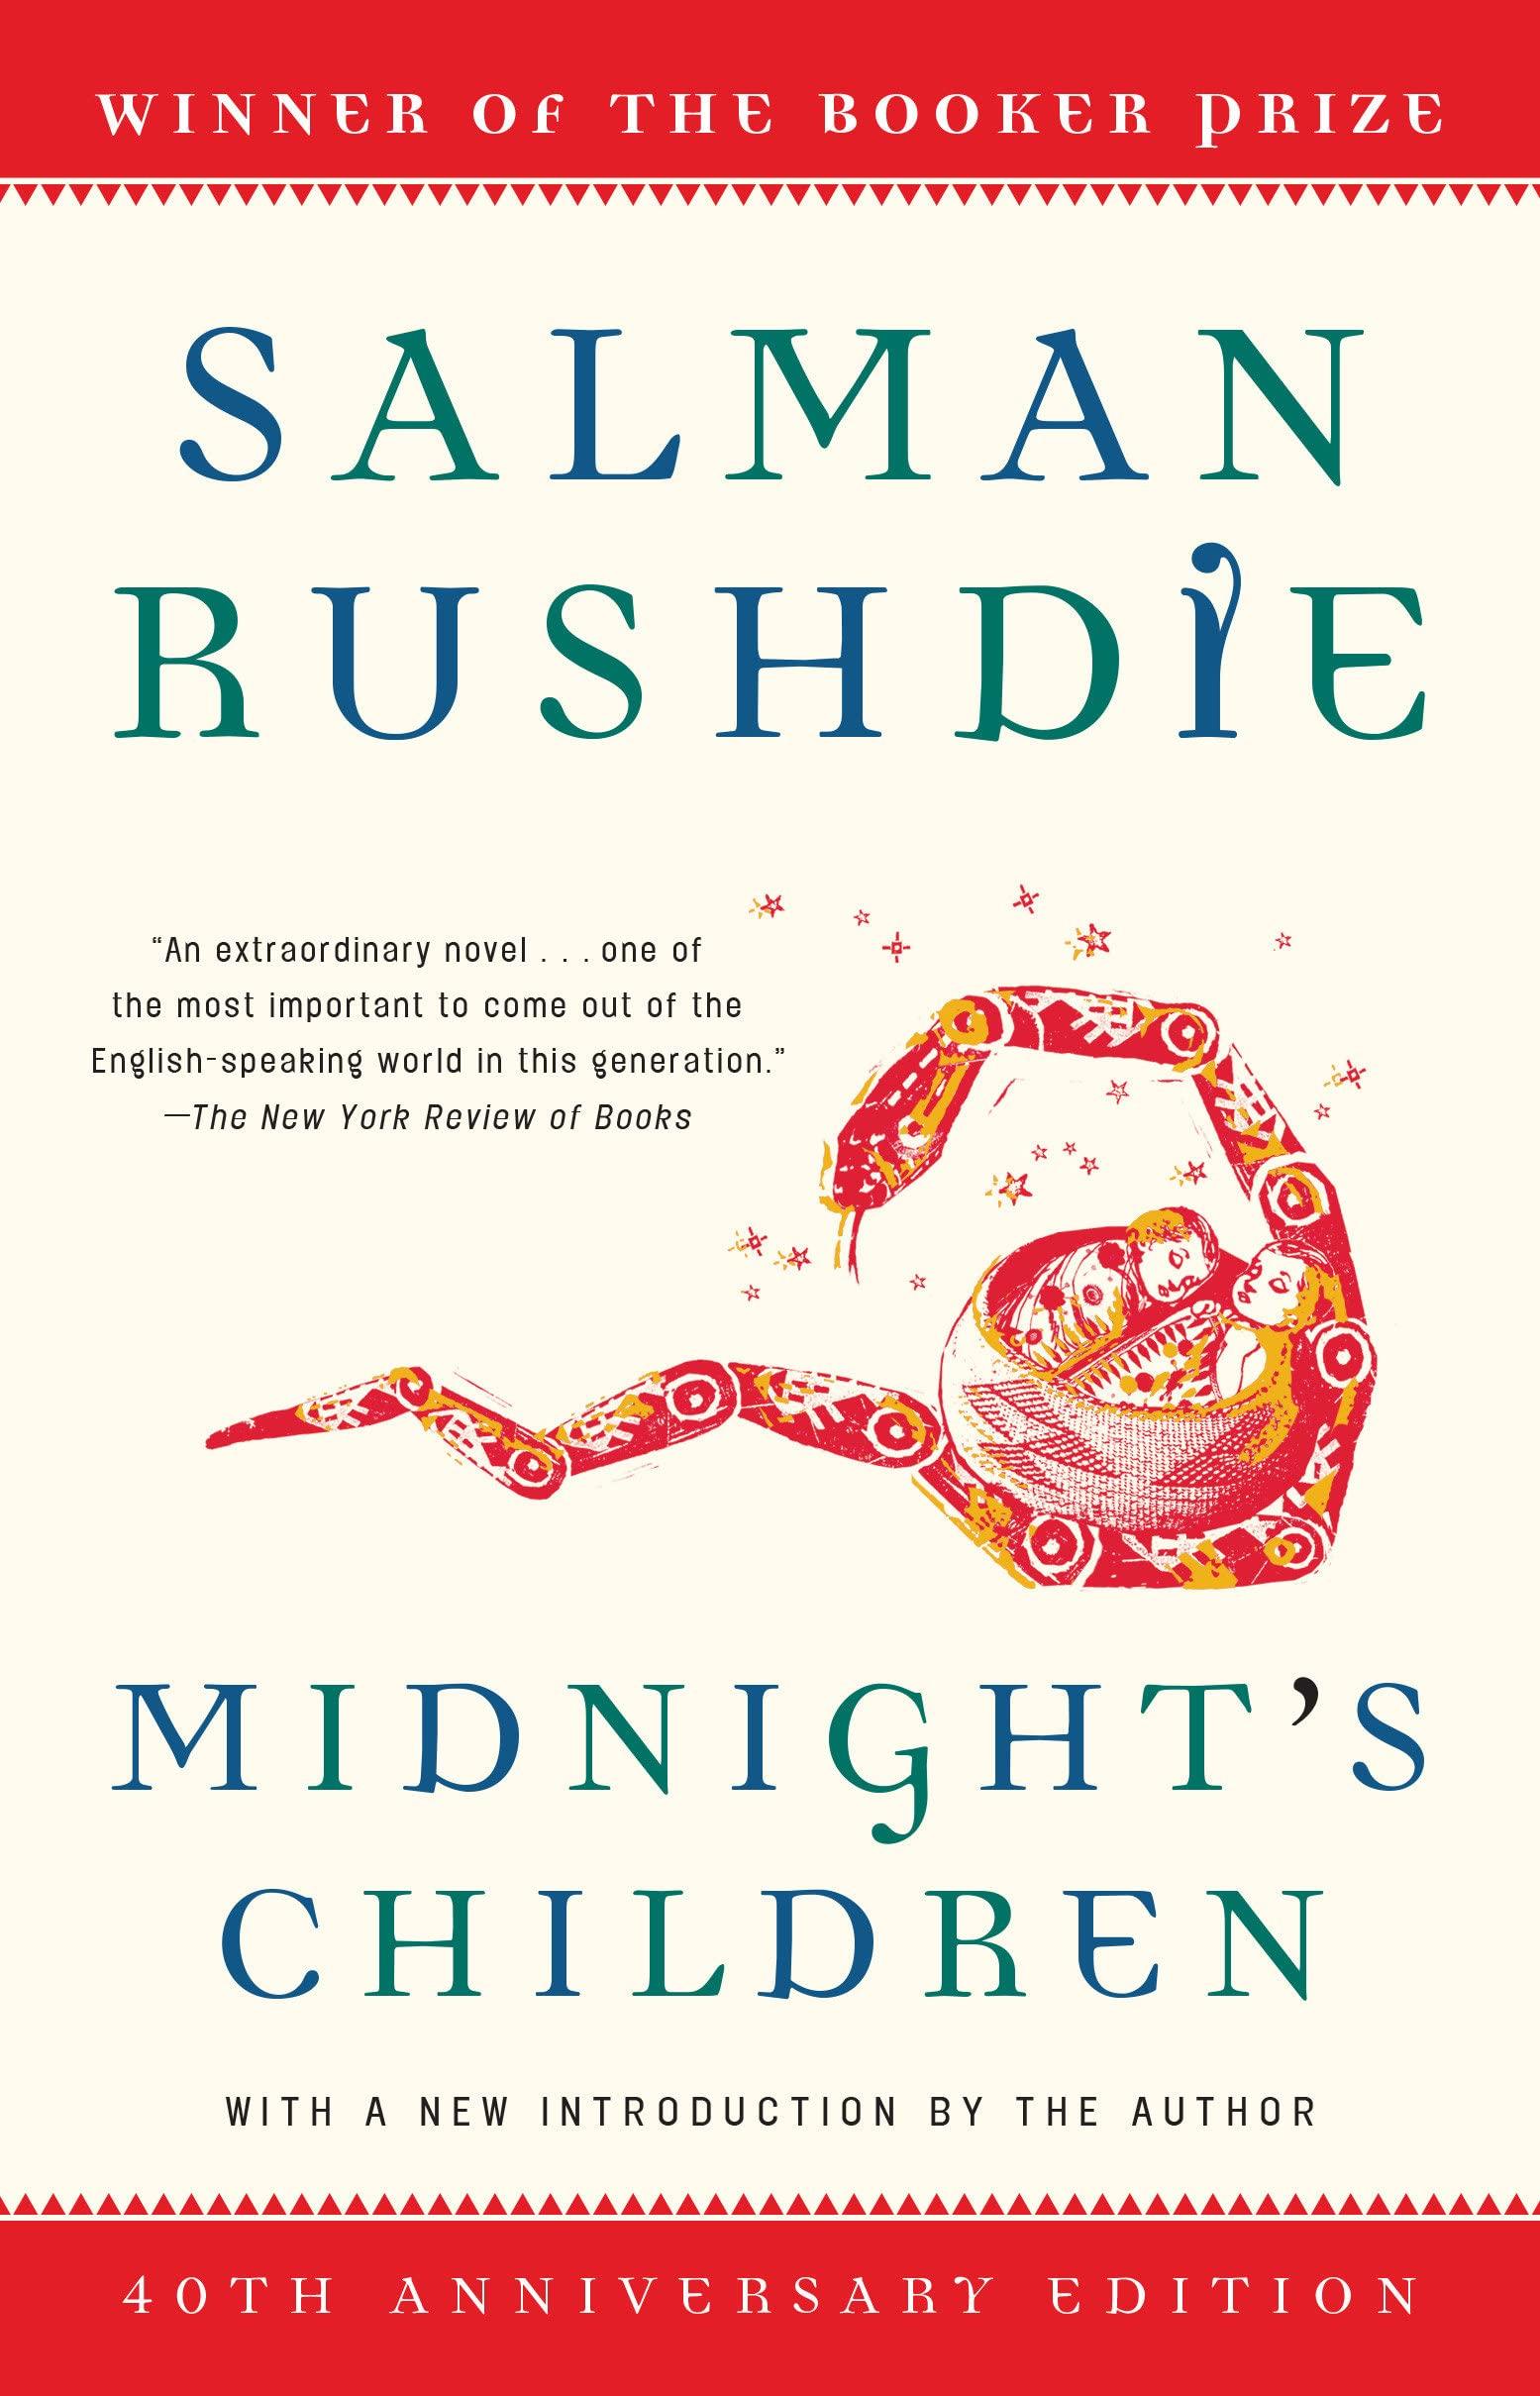 Midnight's Children: A Novel (Modern Library 100 Best Novels) by Salman Rushdie